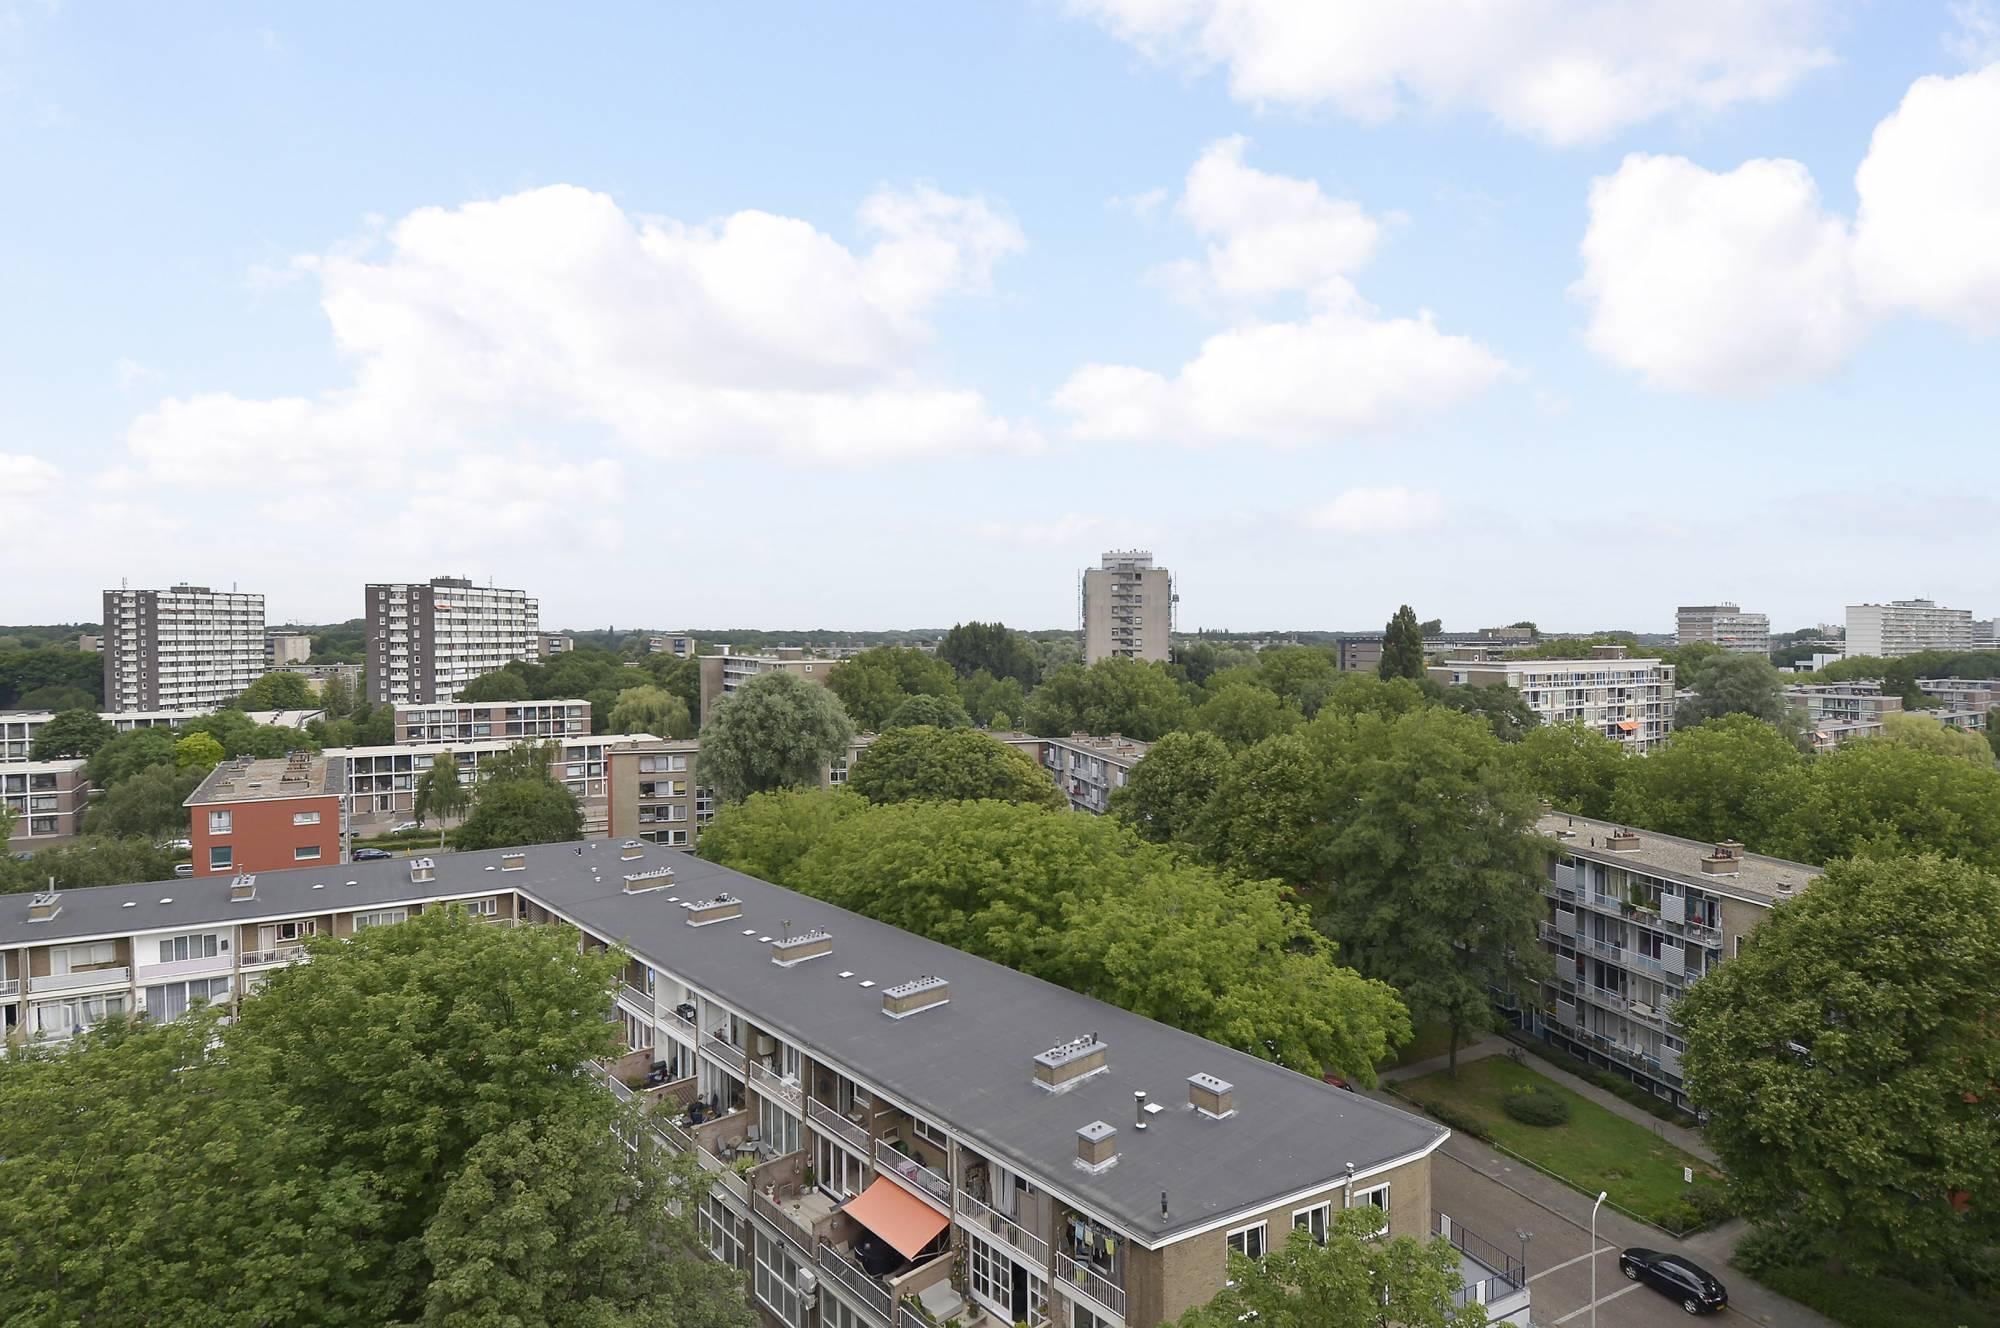 https://public.parariusoffice.nl/185/photos/huge/51287103.1499847407-728.JPG